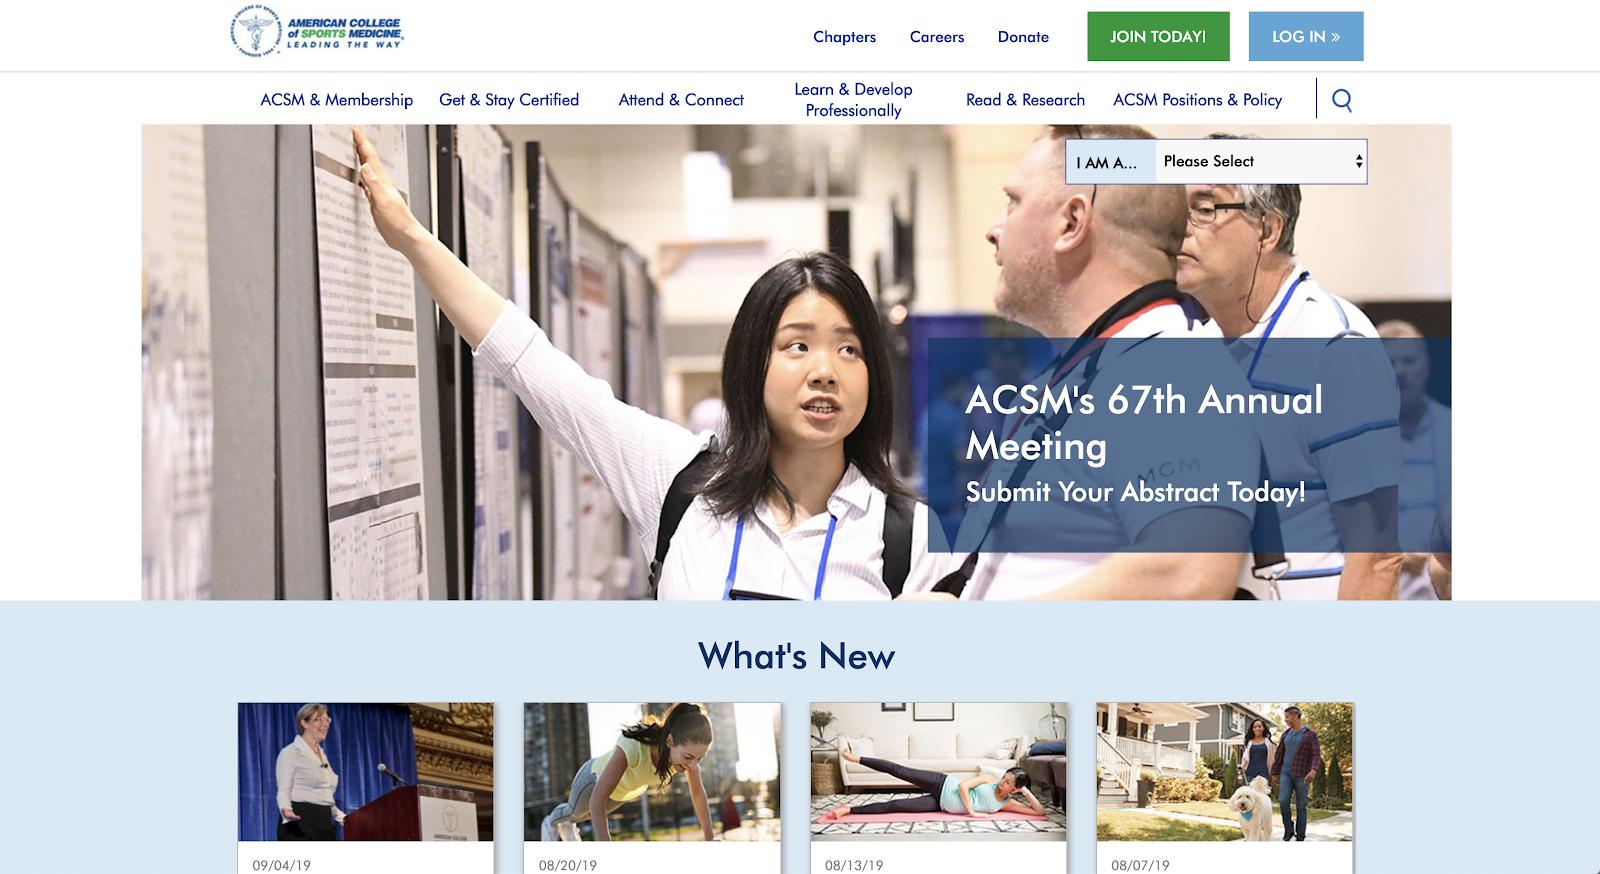 Captura de pantalla del sitio web del American College of Sports Medicine